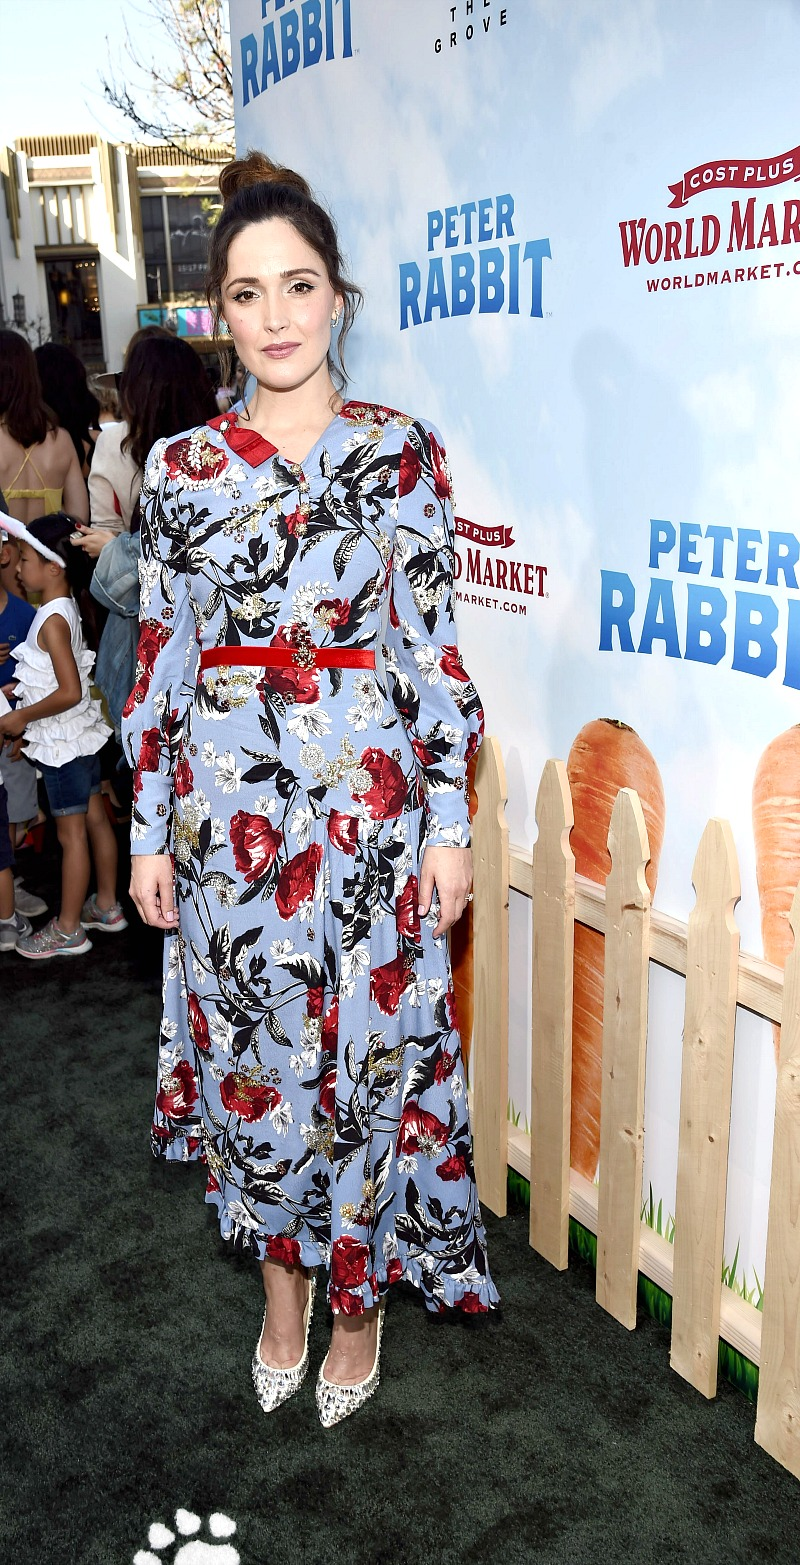 Rose Byrne at Red Carpet